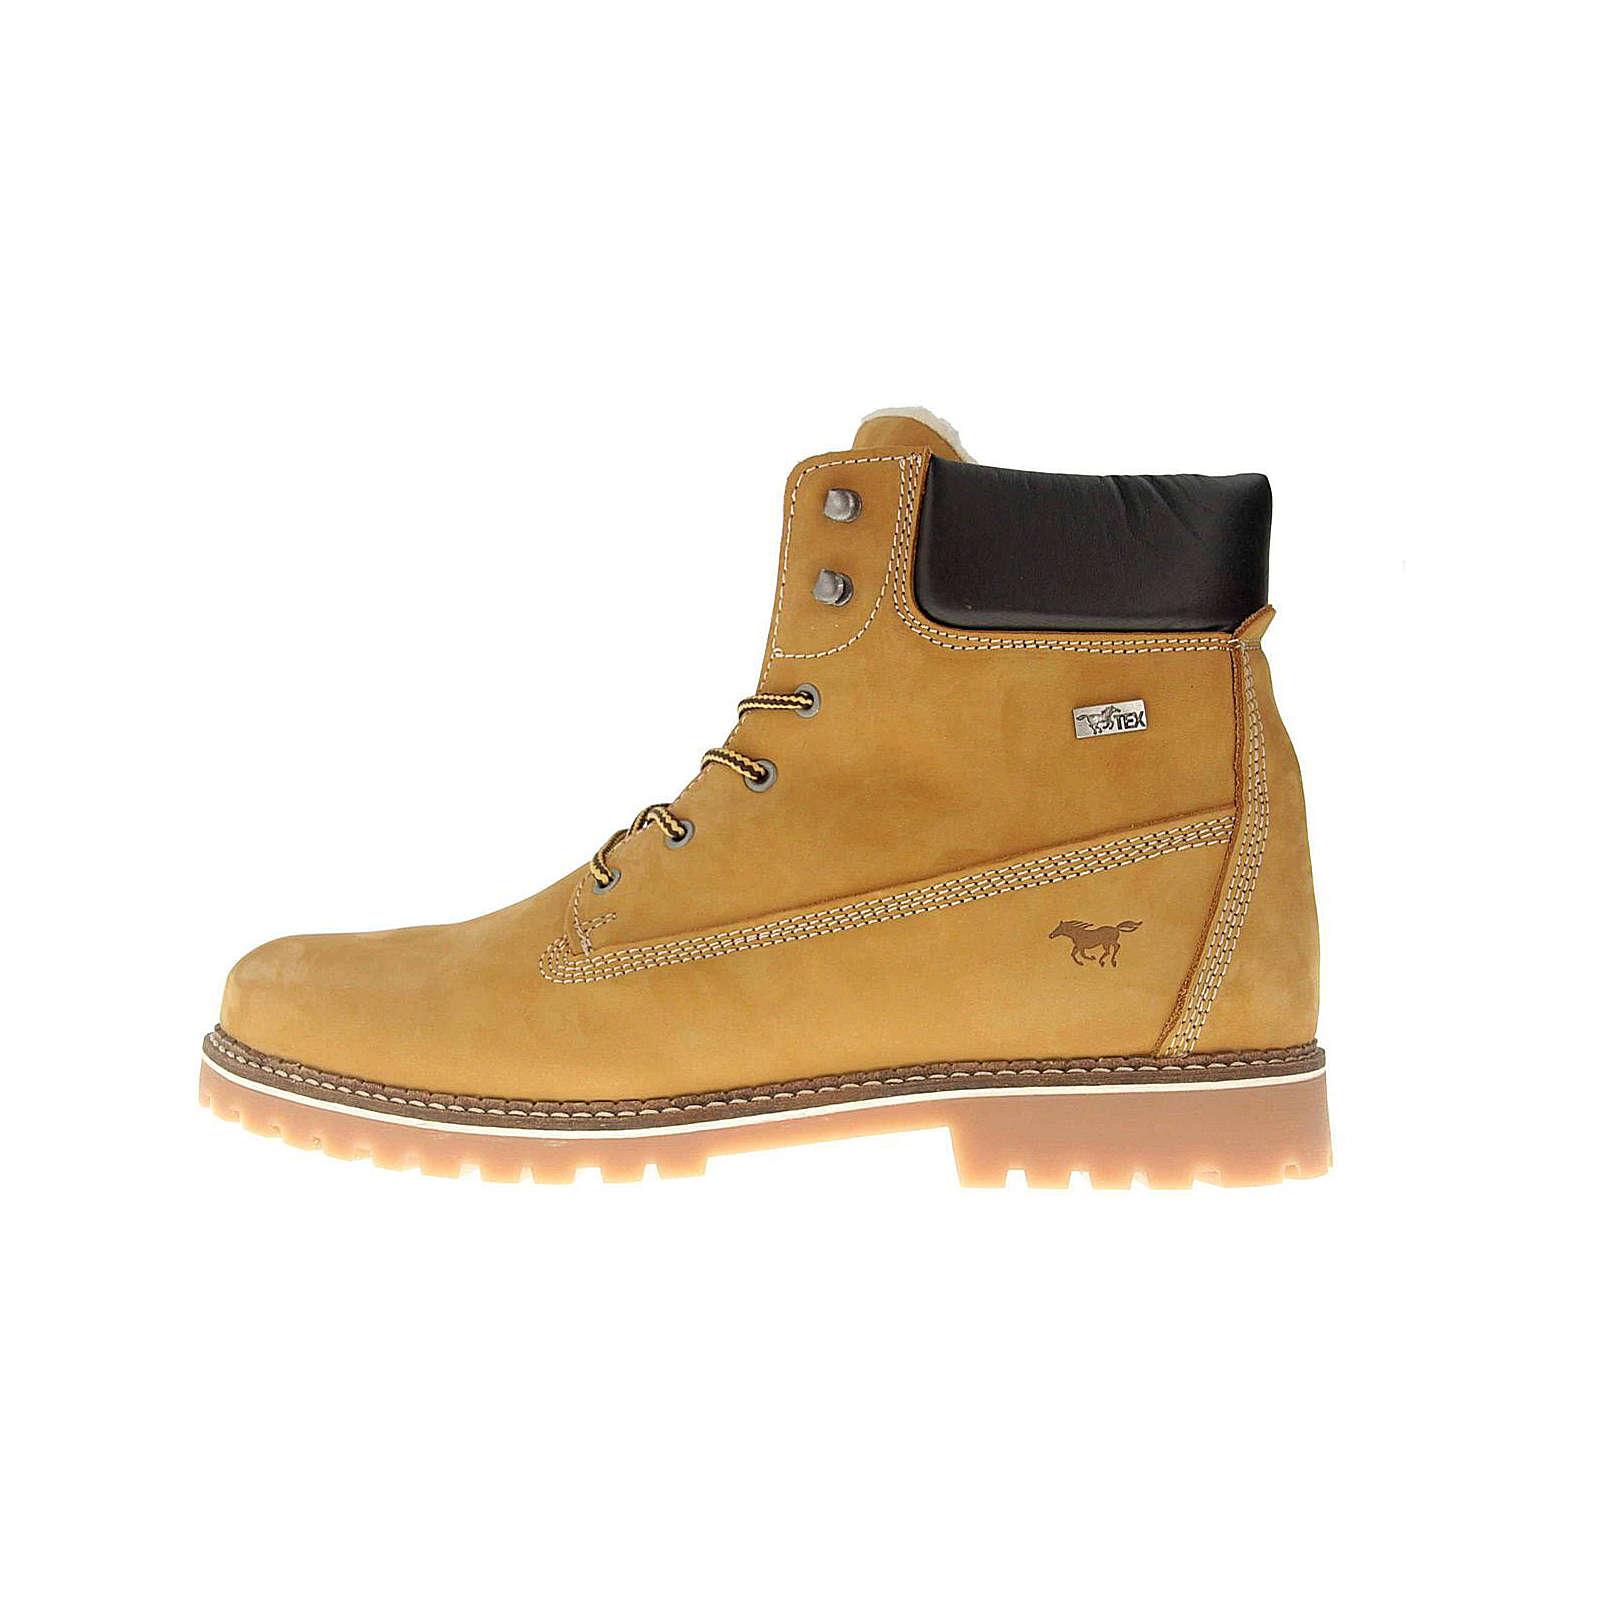 MUSTANG Boots braun Herren Gr. 50